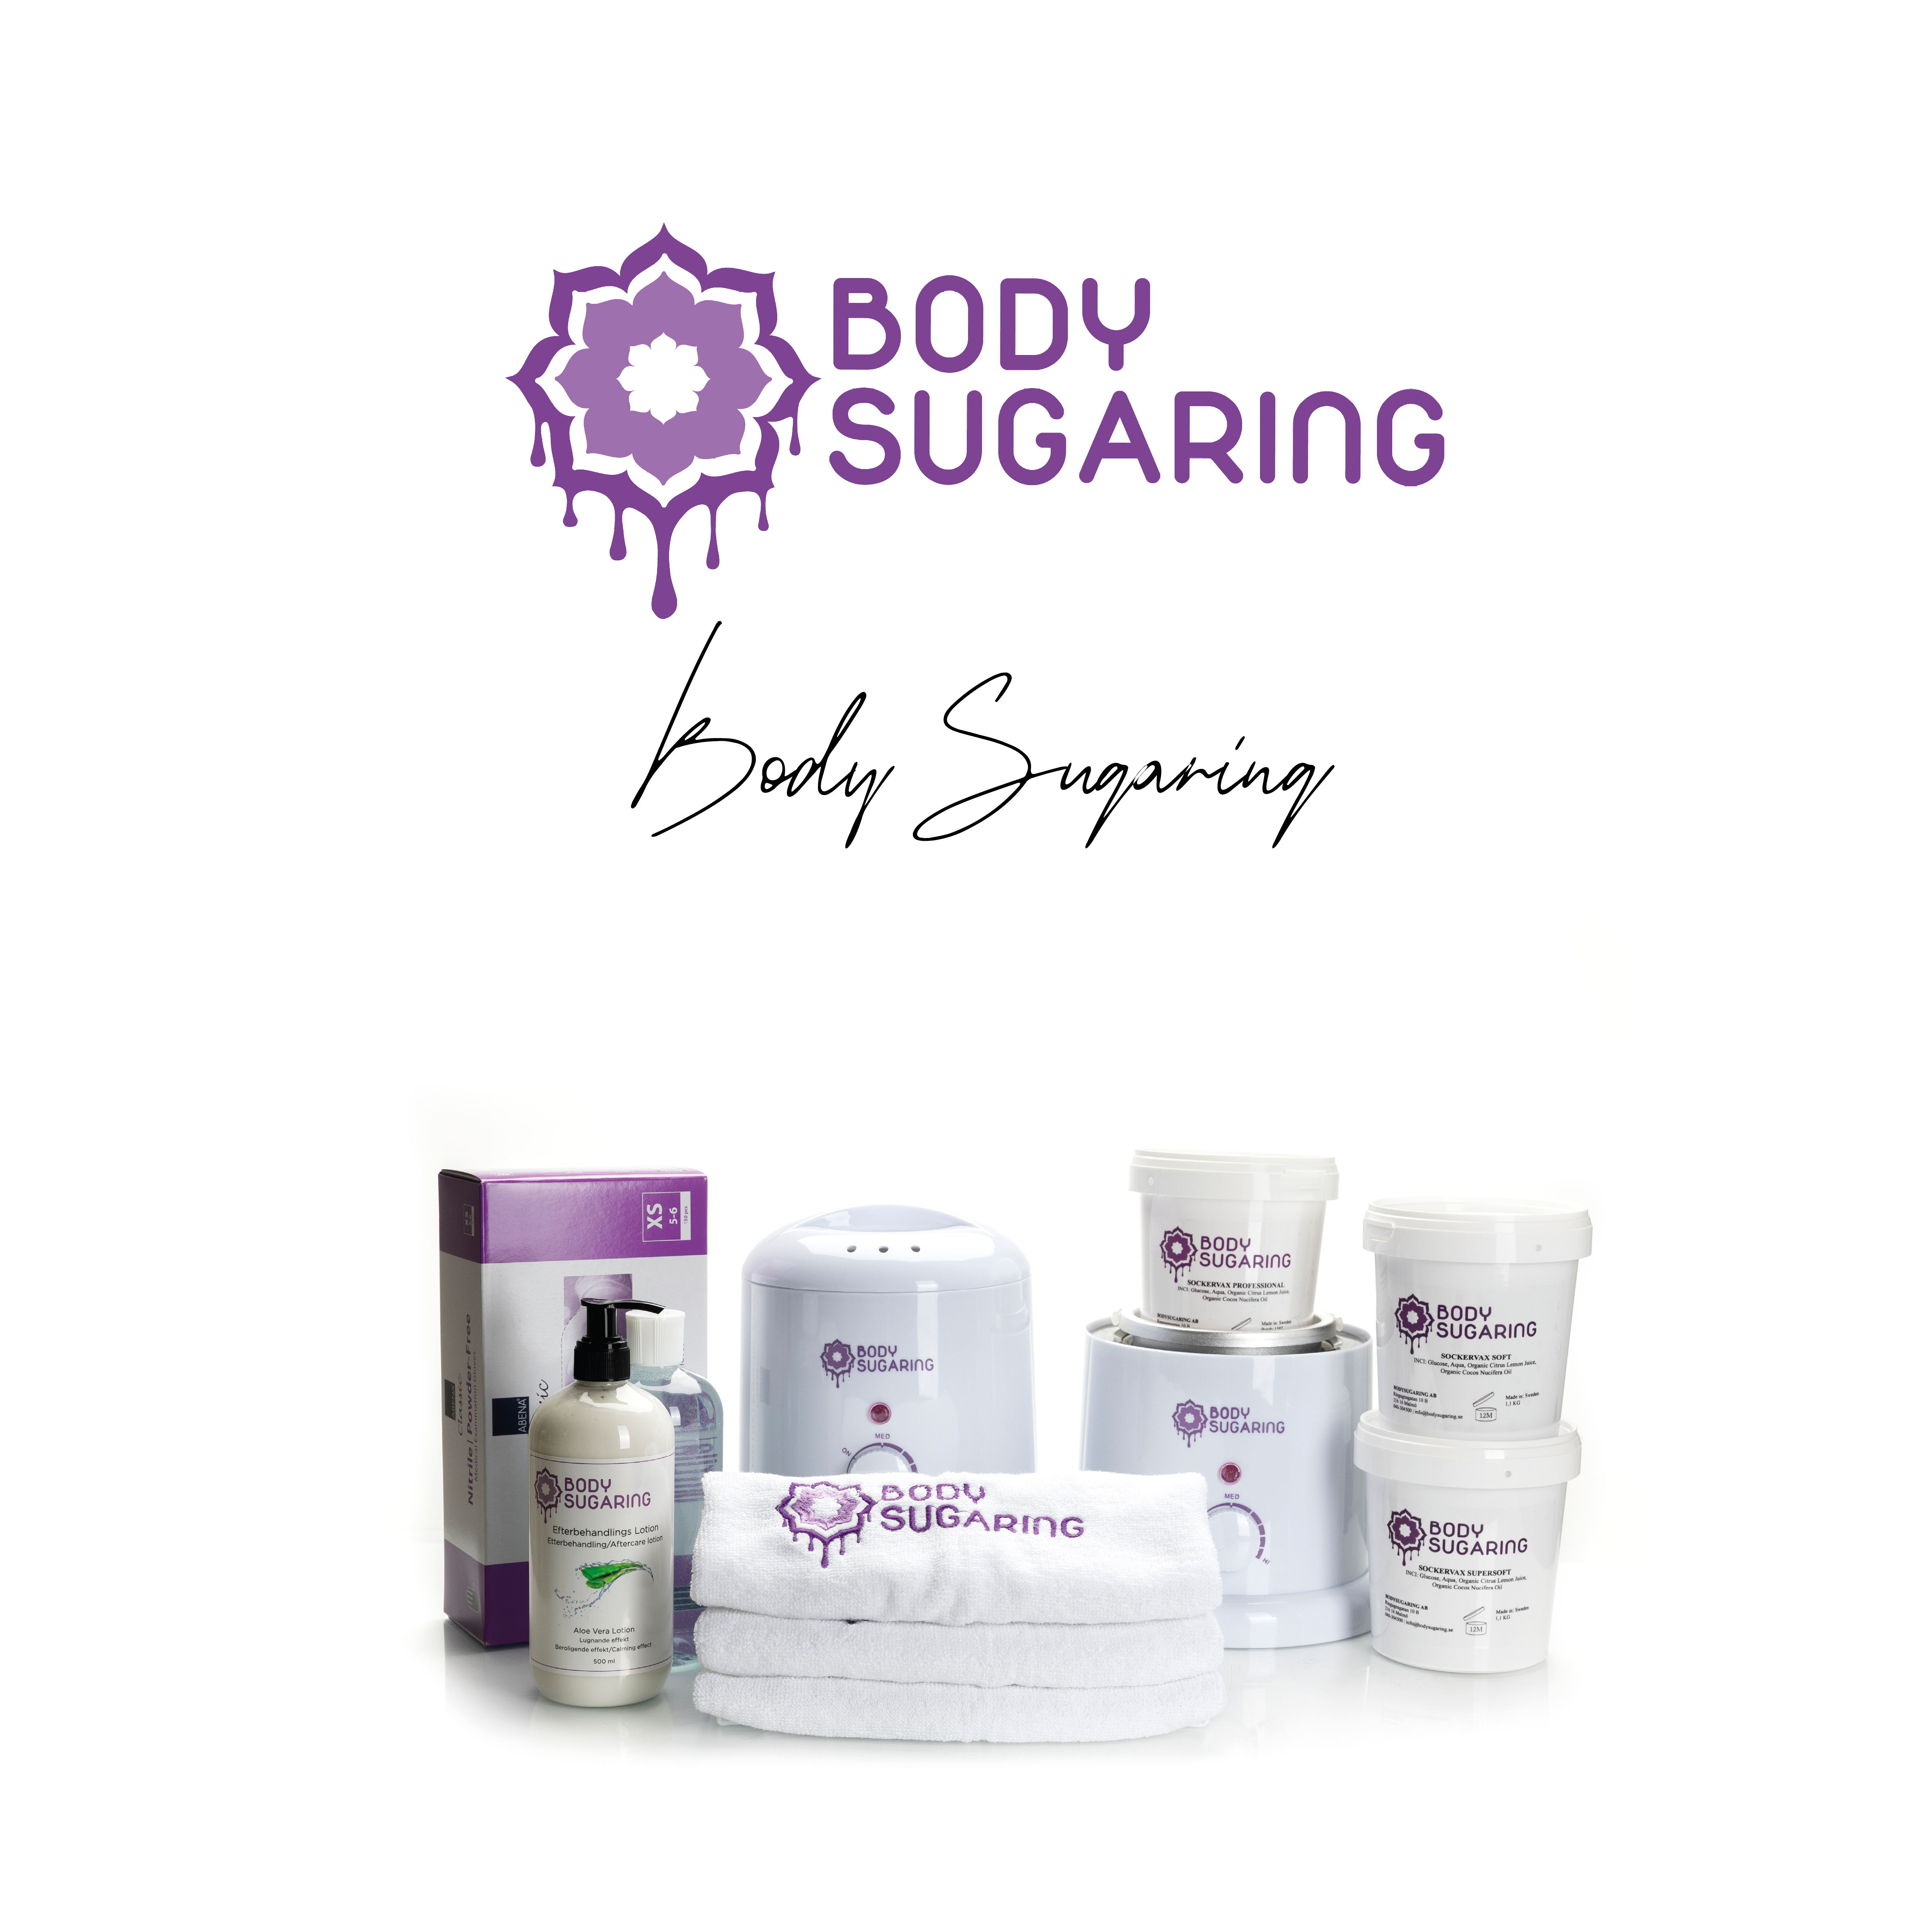 body sugaring